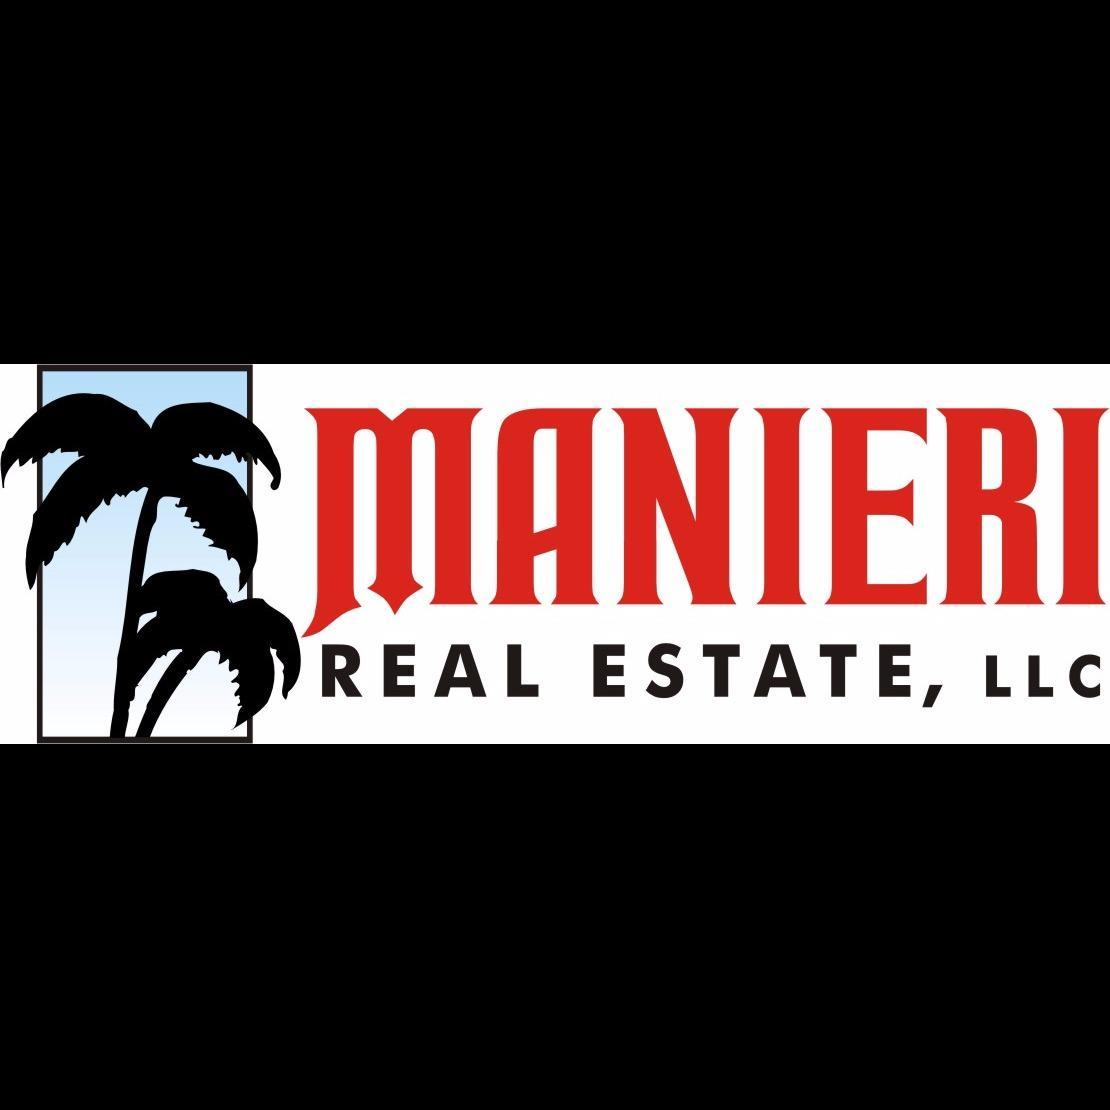 Manieri Real Estate, LLC